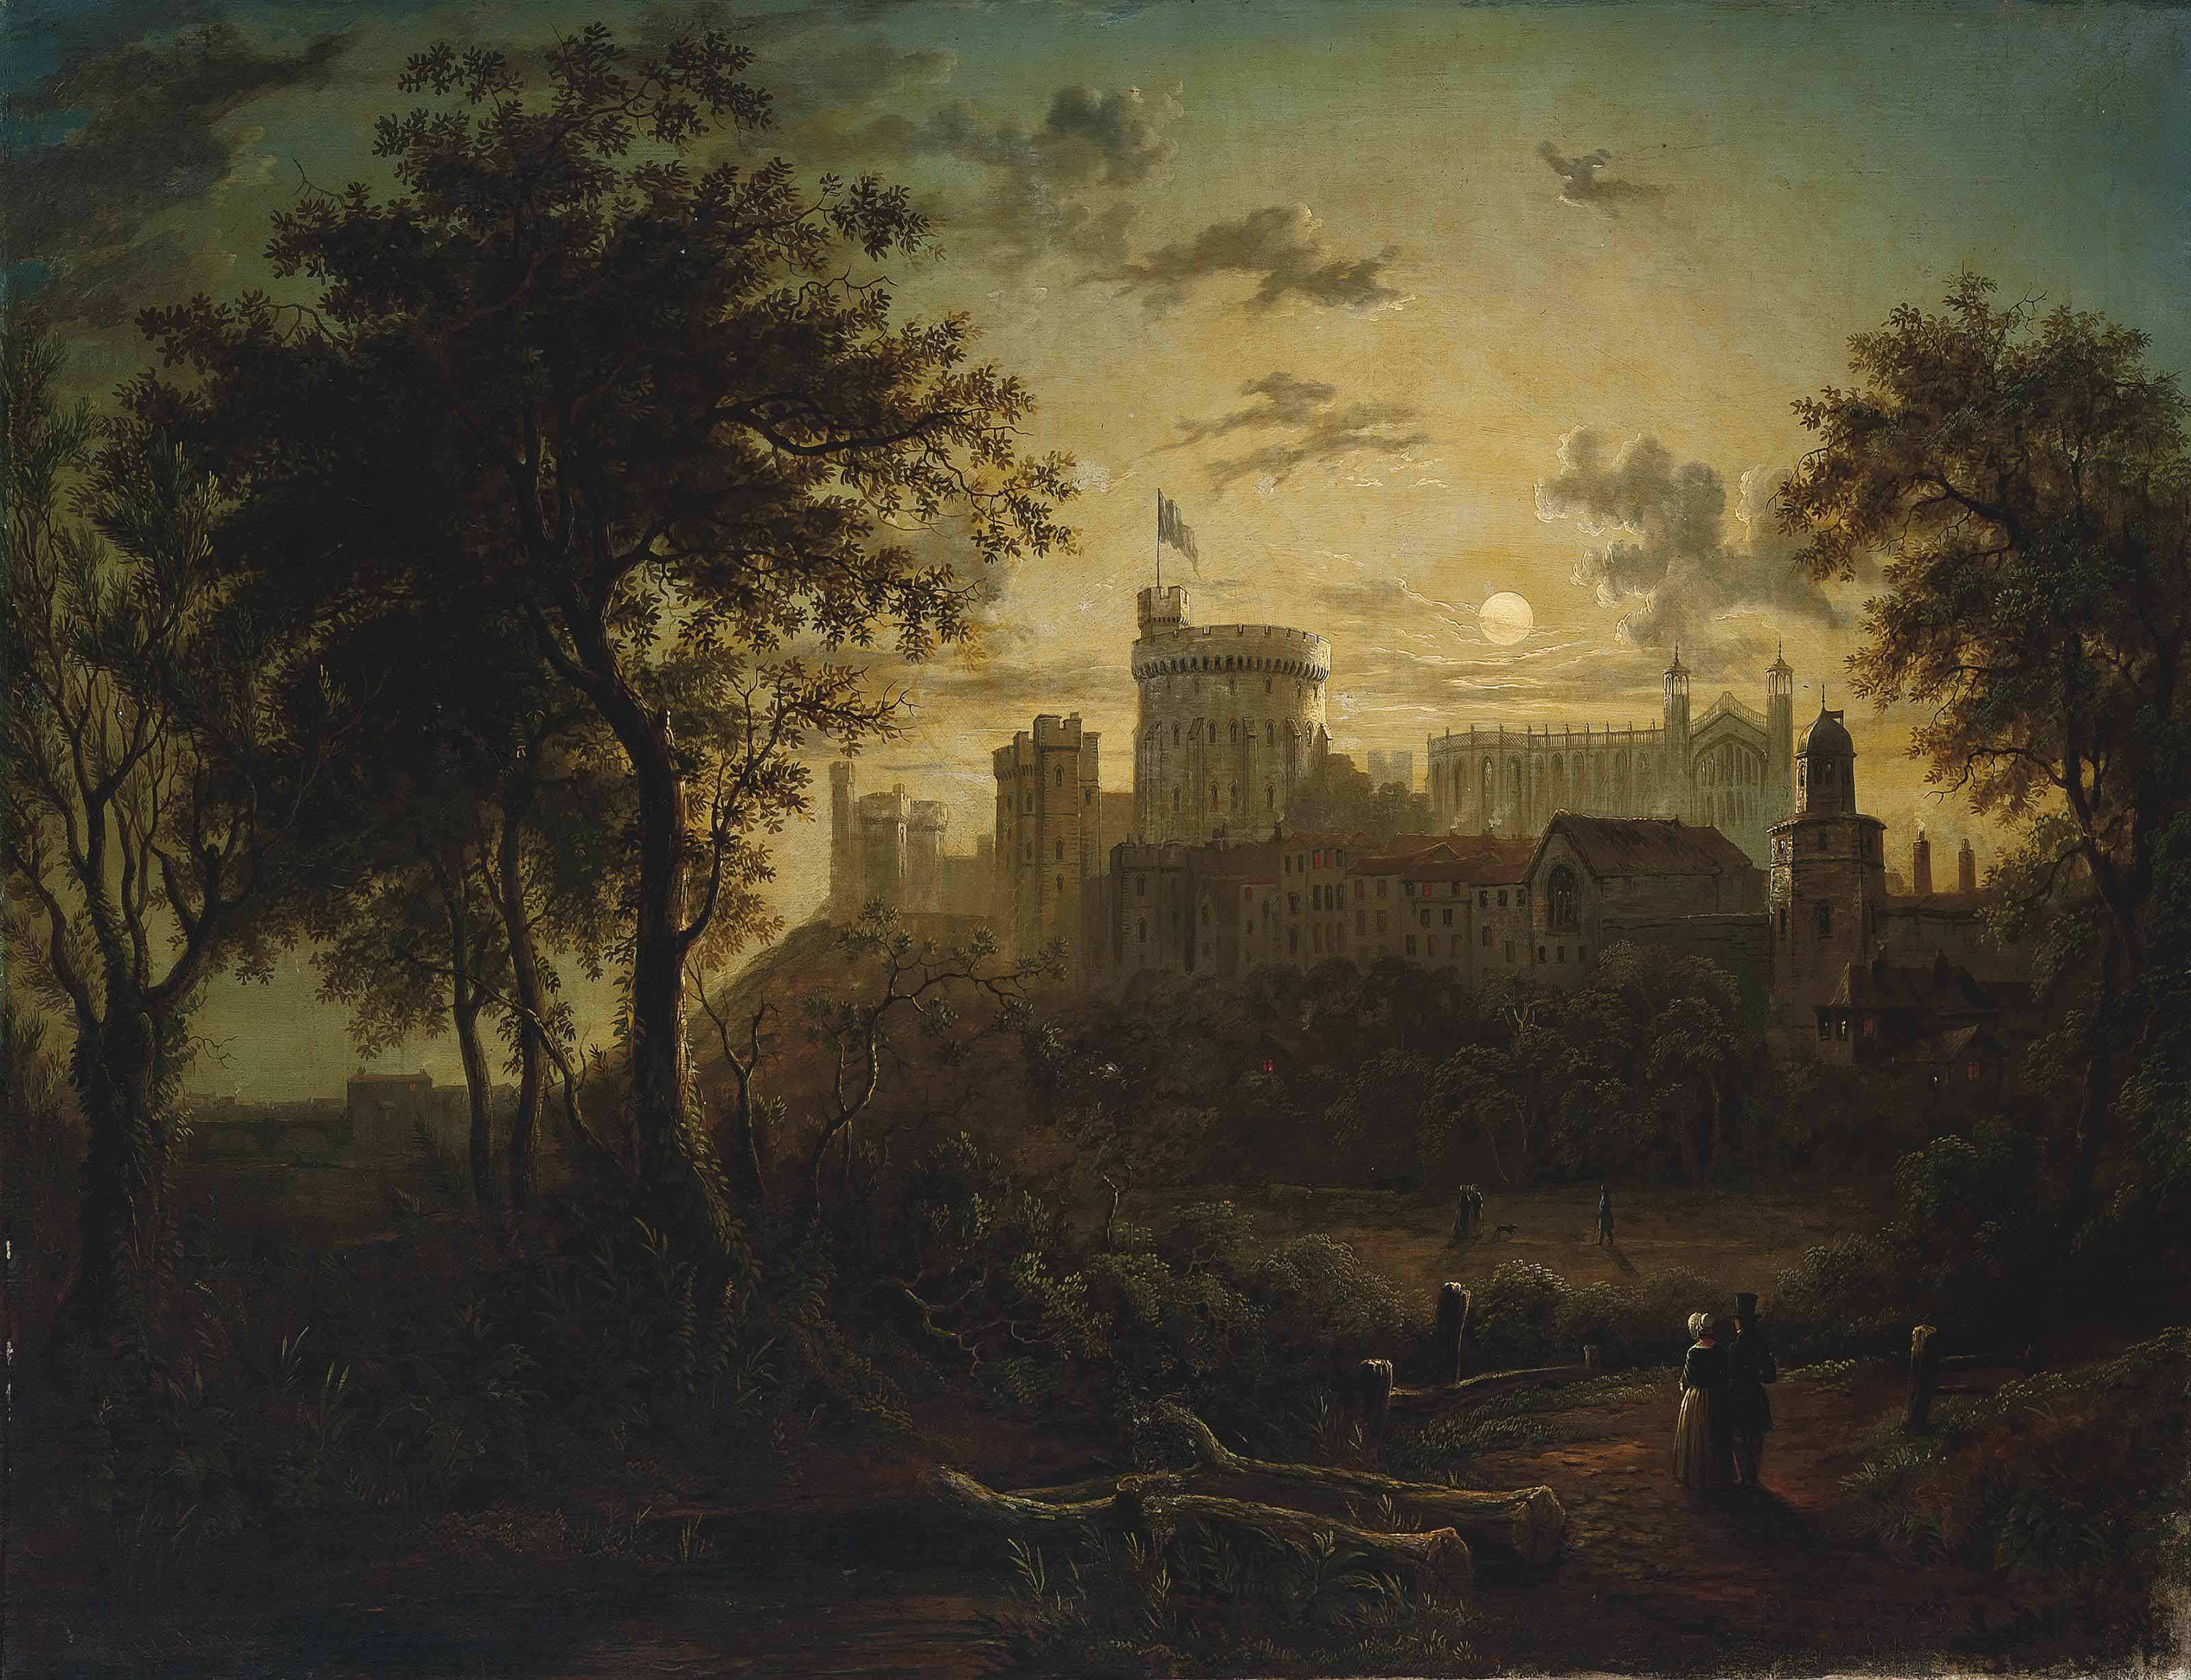 Figures before Windsor Castle, by moonlight